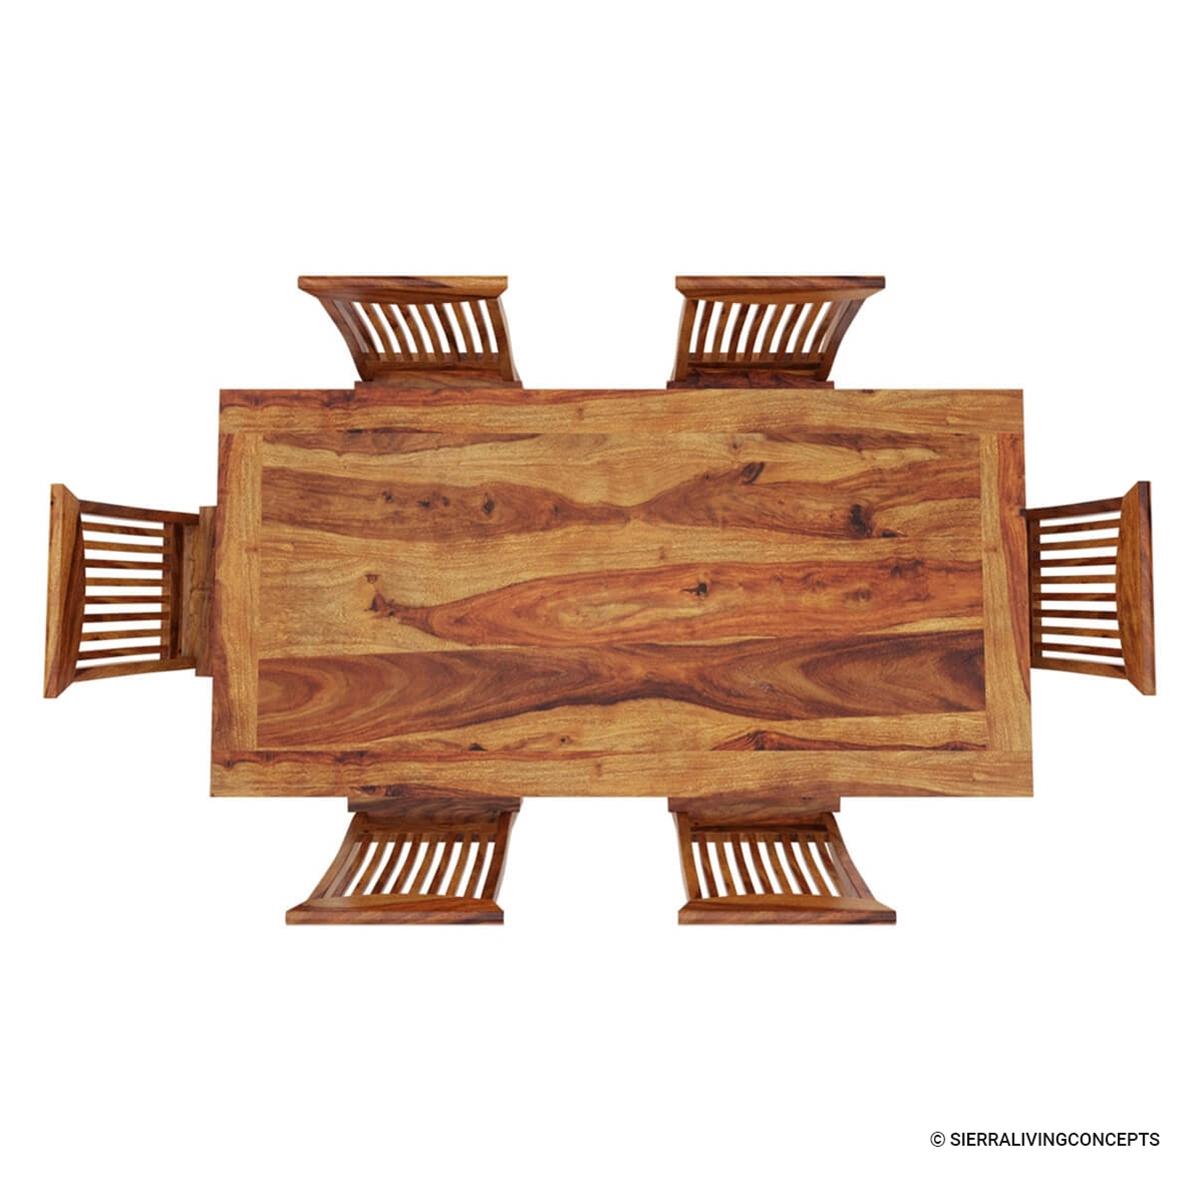 Rustic Modern Wood Dining Chair: Idaho Modern Rustic Solid Wood Dining Table & Chair Set